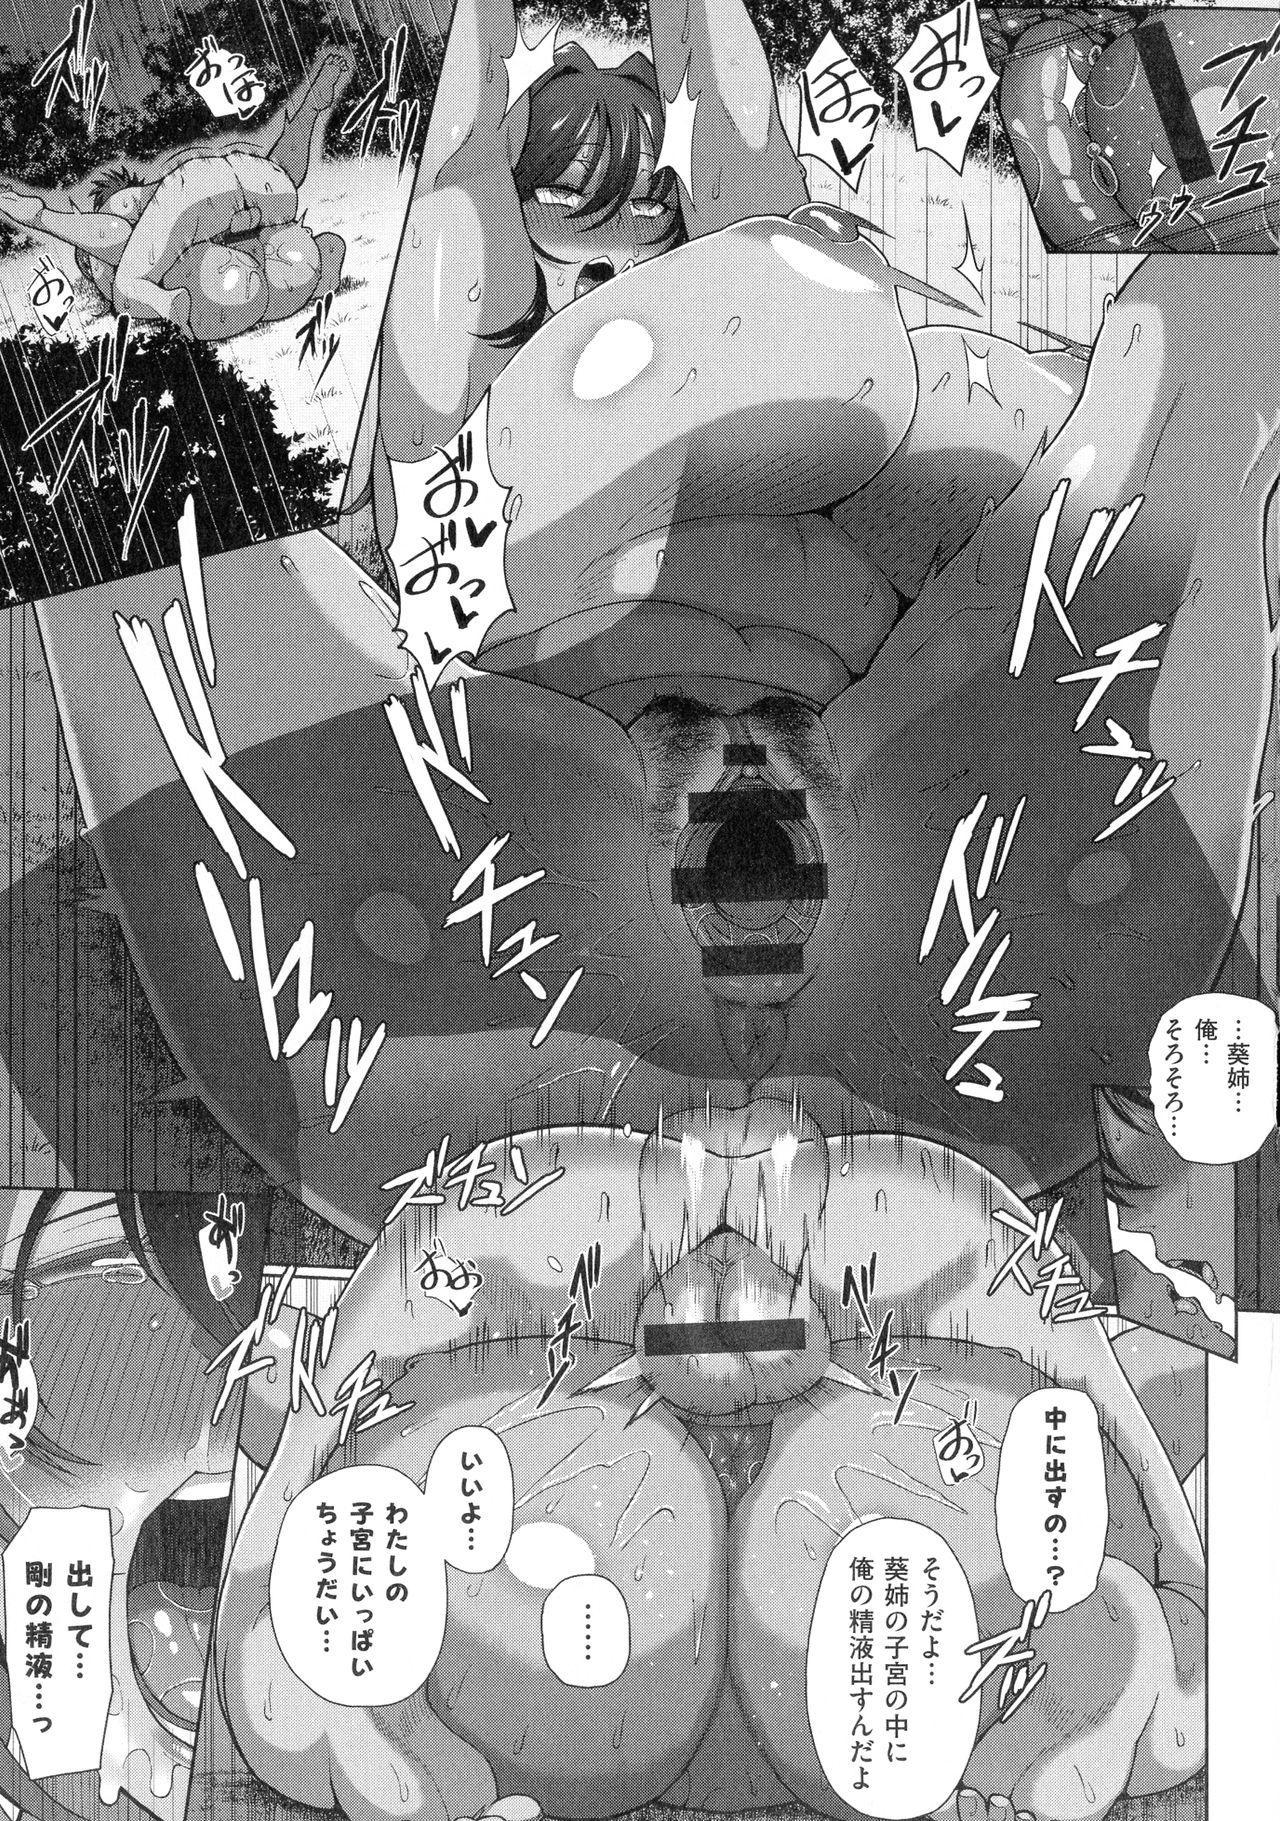 Juku Mesu - Erotic Mature Women 51